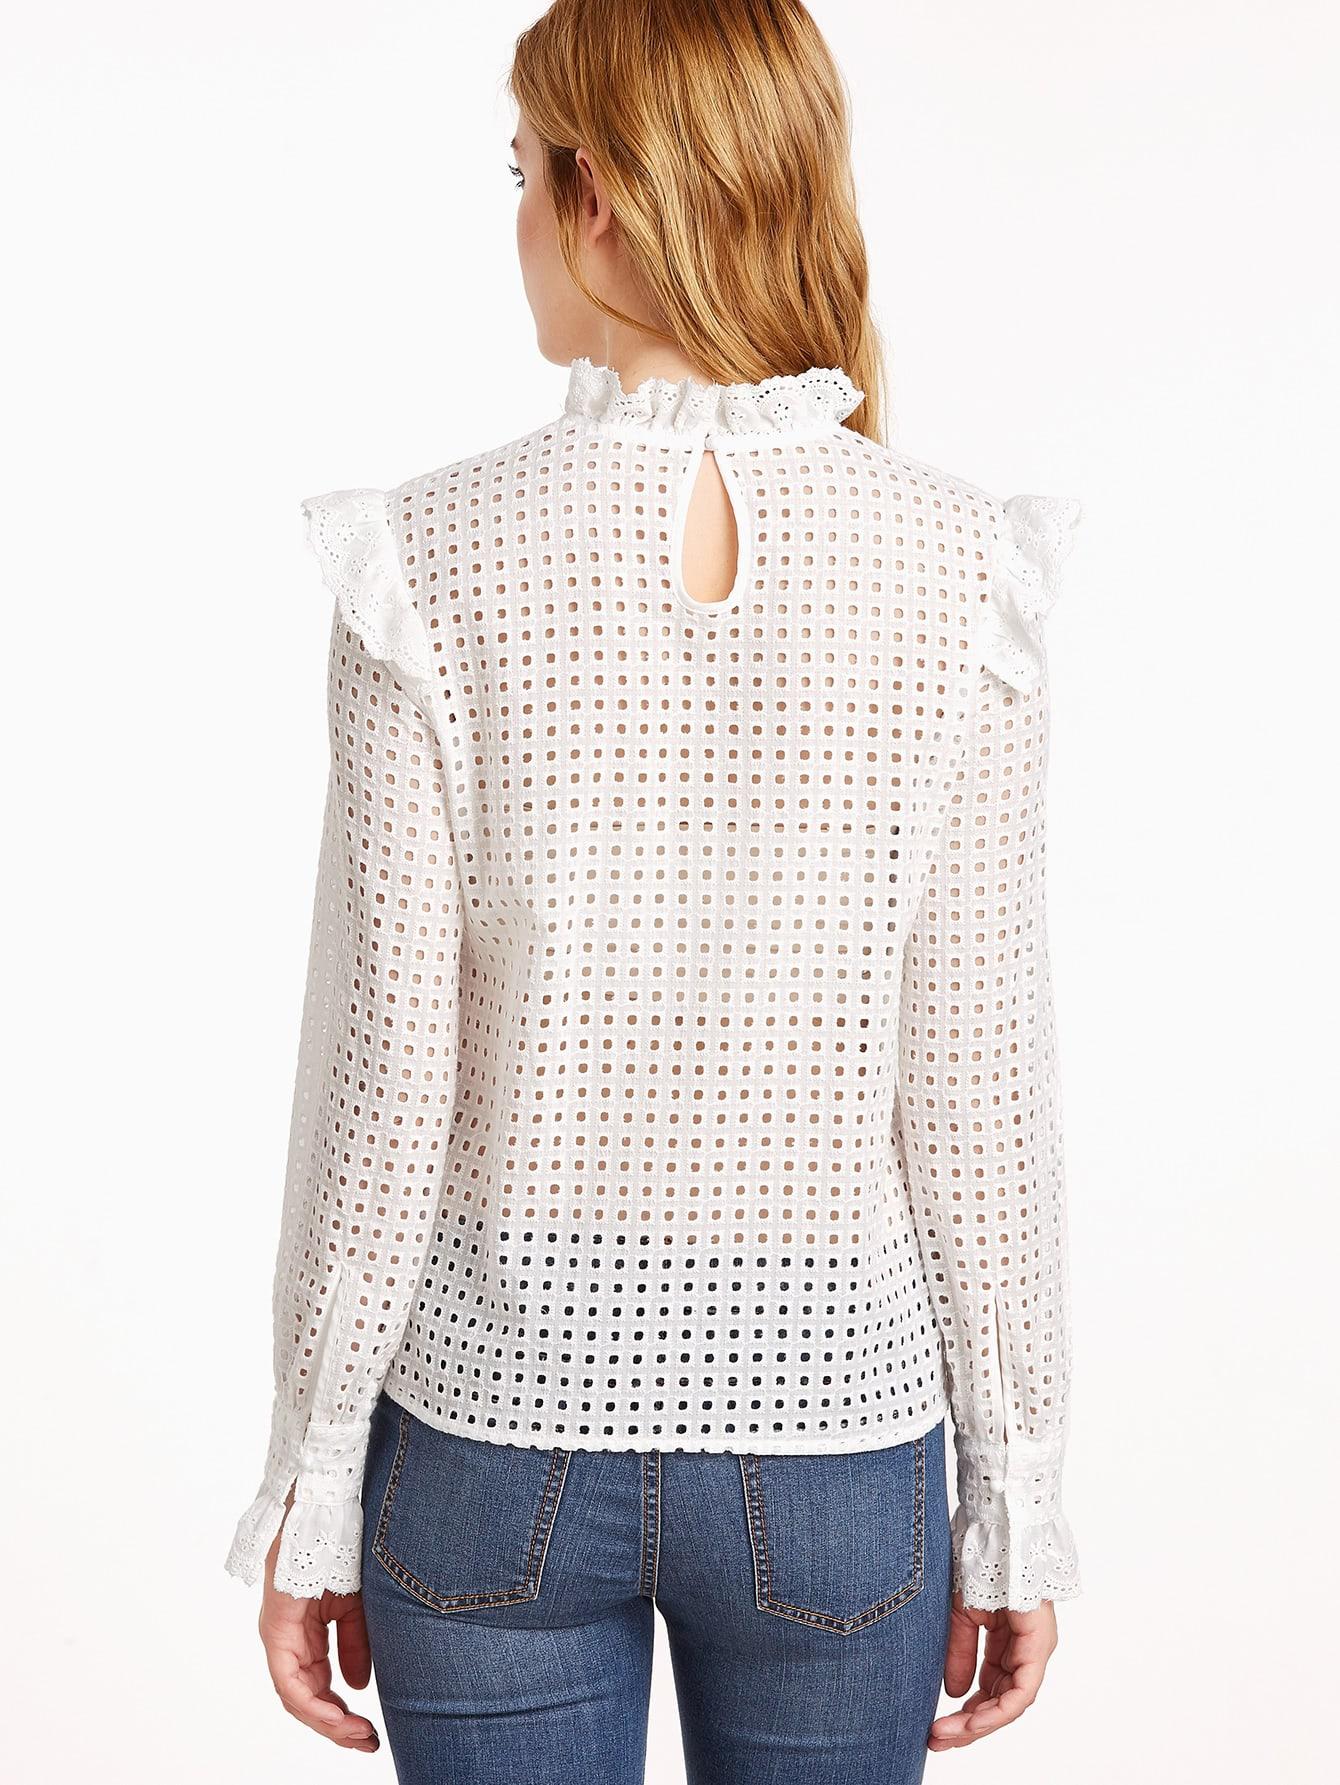 blouse161124702_2